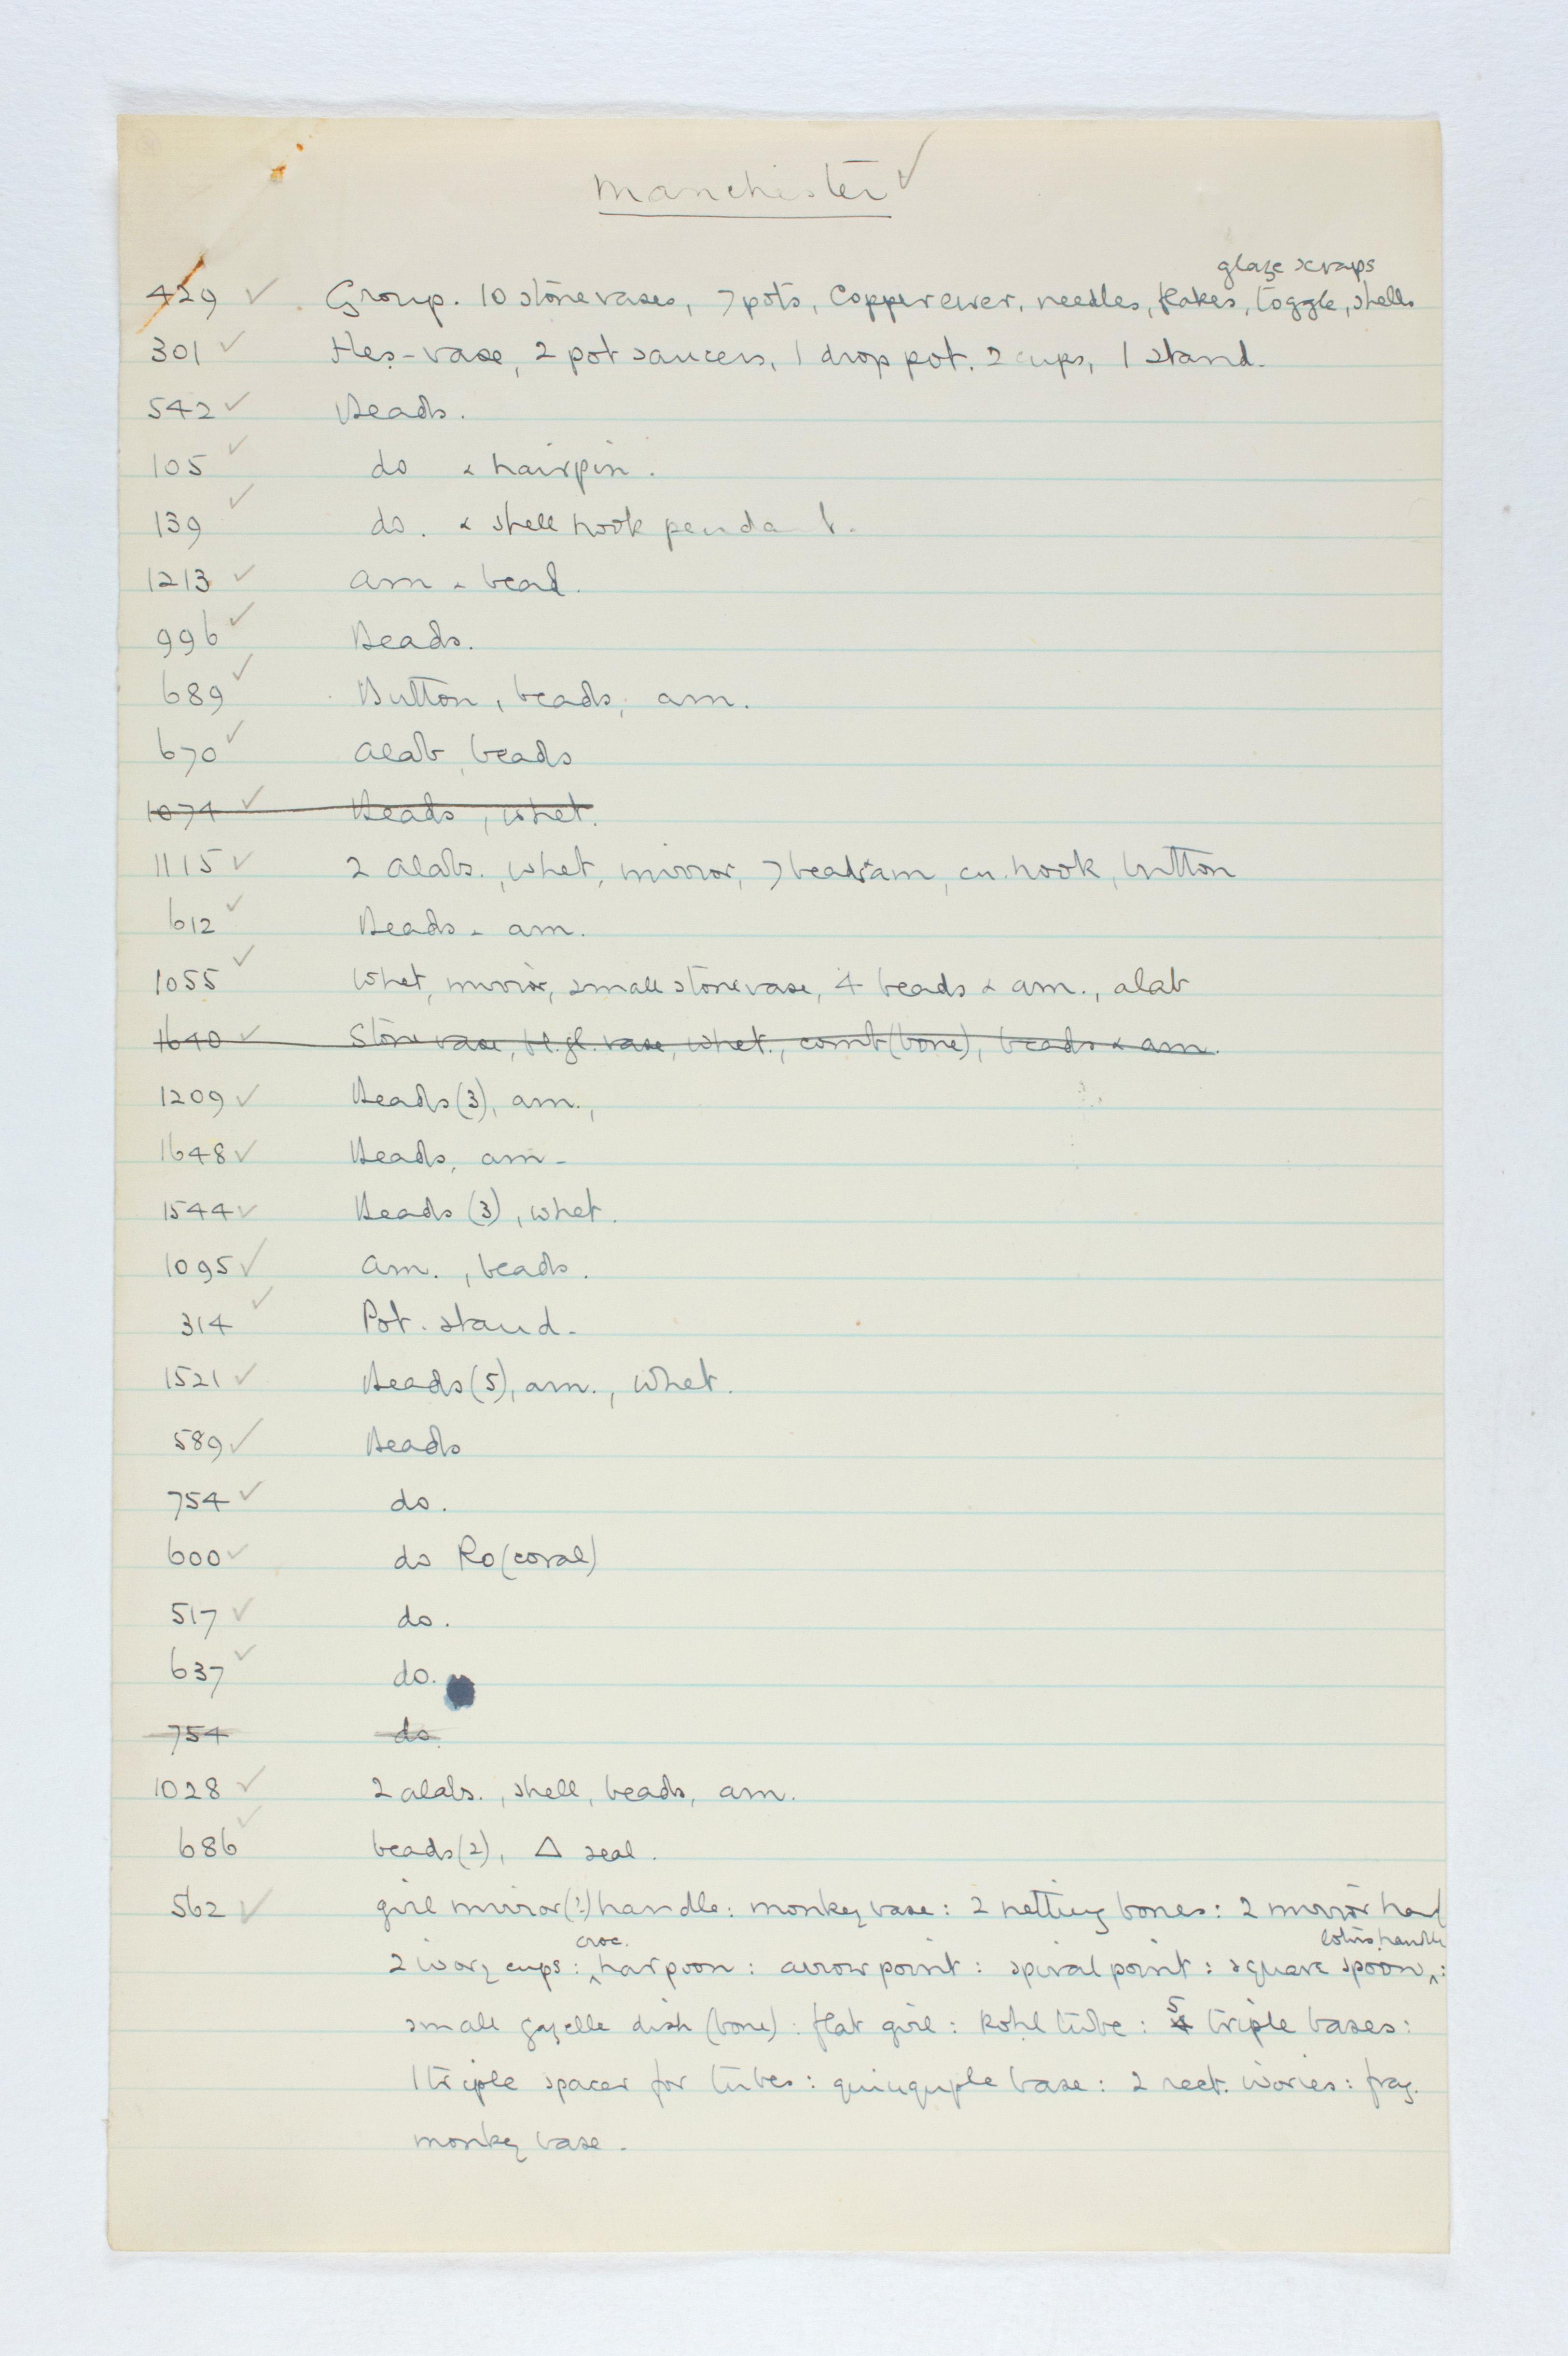 1922-23 Qau el-Kebir Individual institution list PMA/WFP1/D/26/18.1